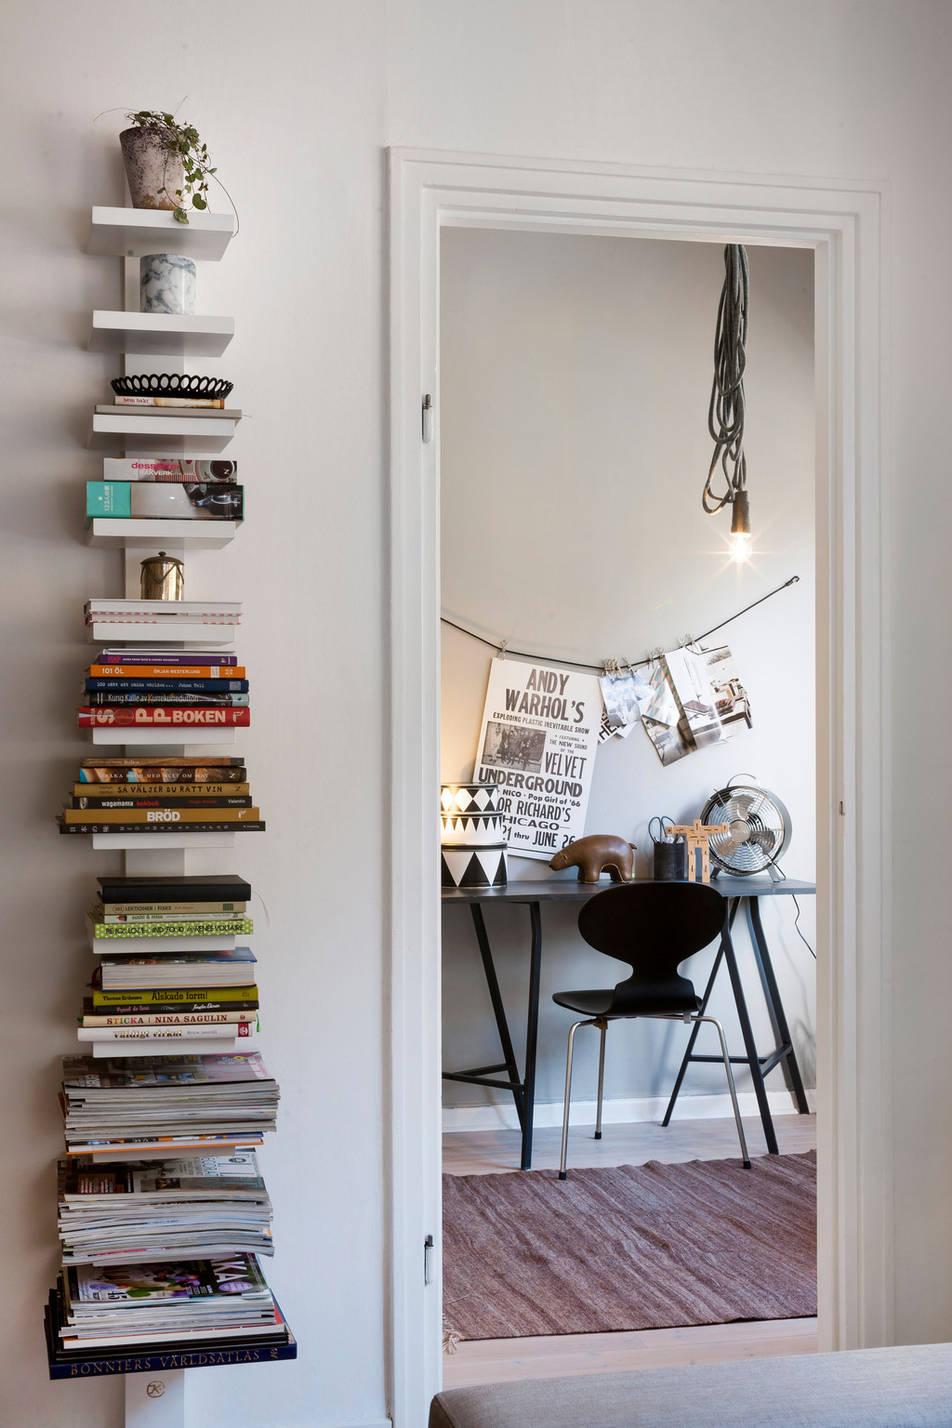 L mparas colgantes bombilla y flexos blog tienda for Libri finti ikea